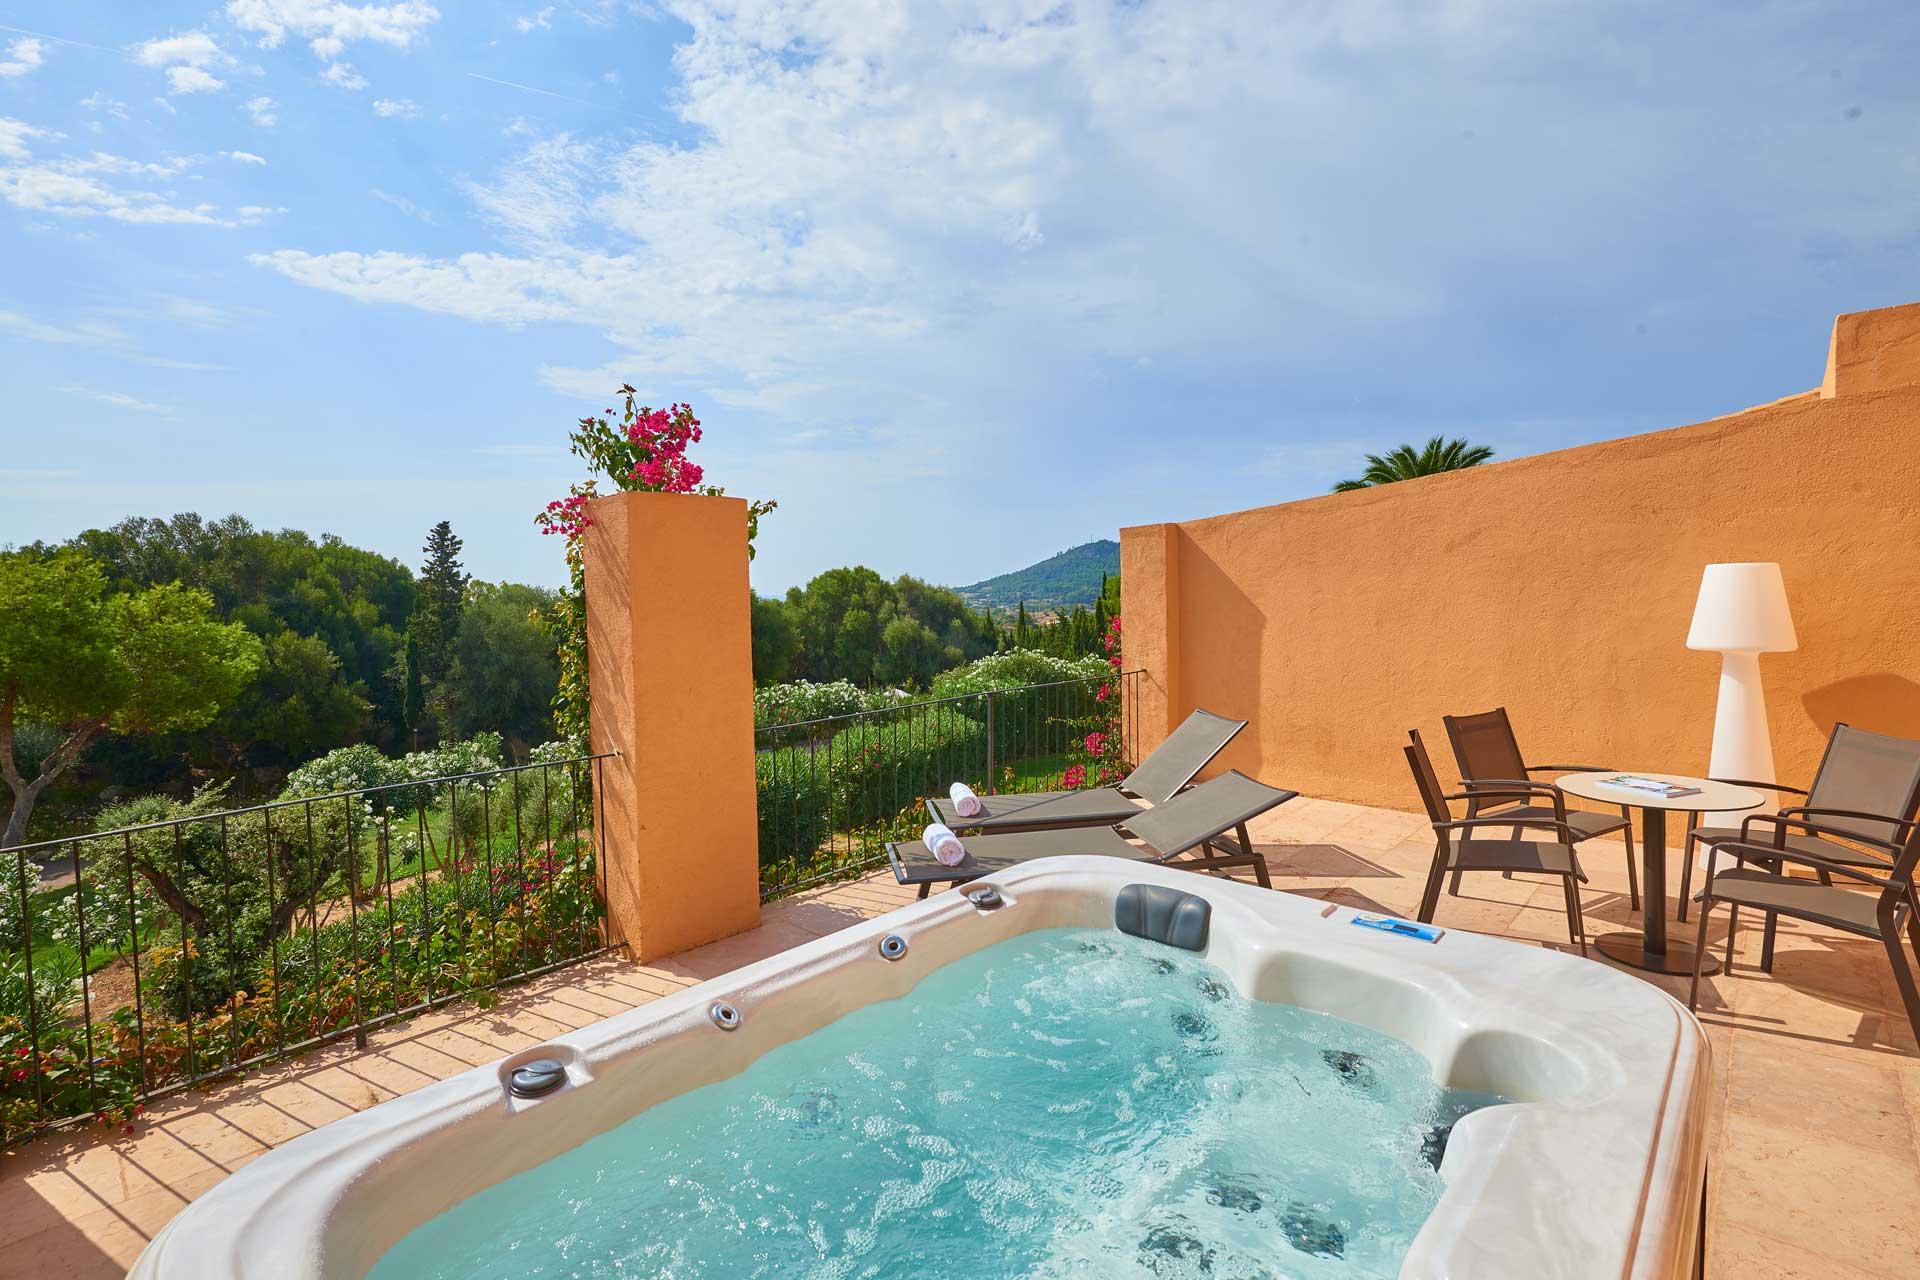 Finca-Hotel Sentido Pula Suites - Superior Suite de Luxe with jacuzzi